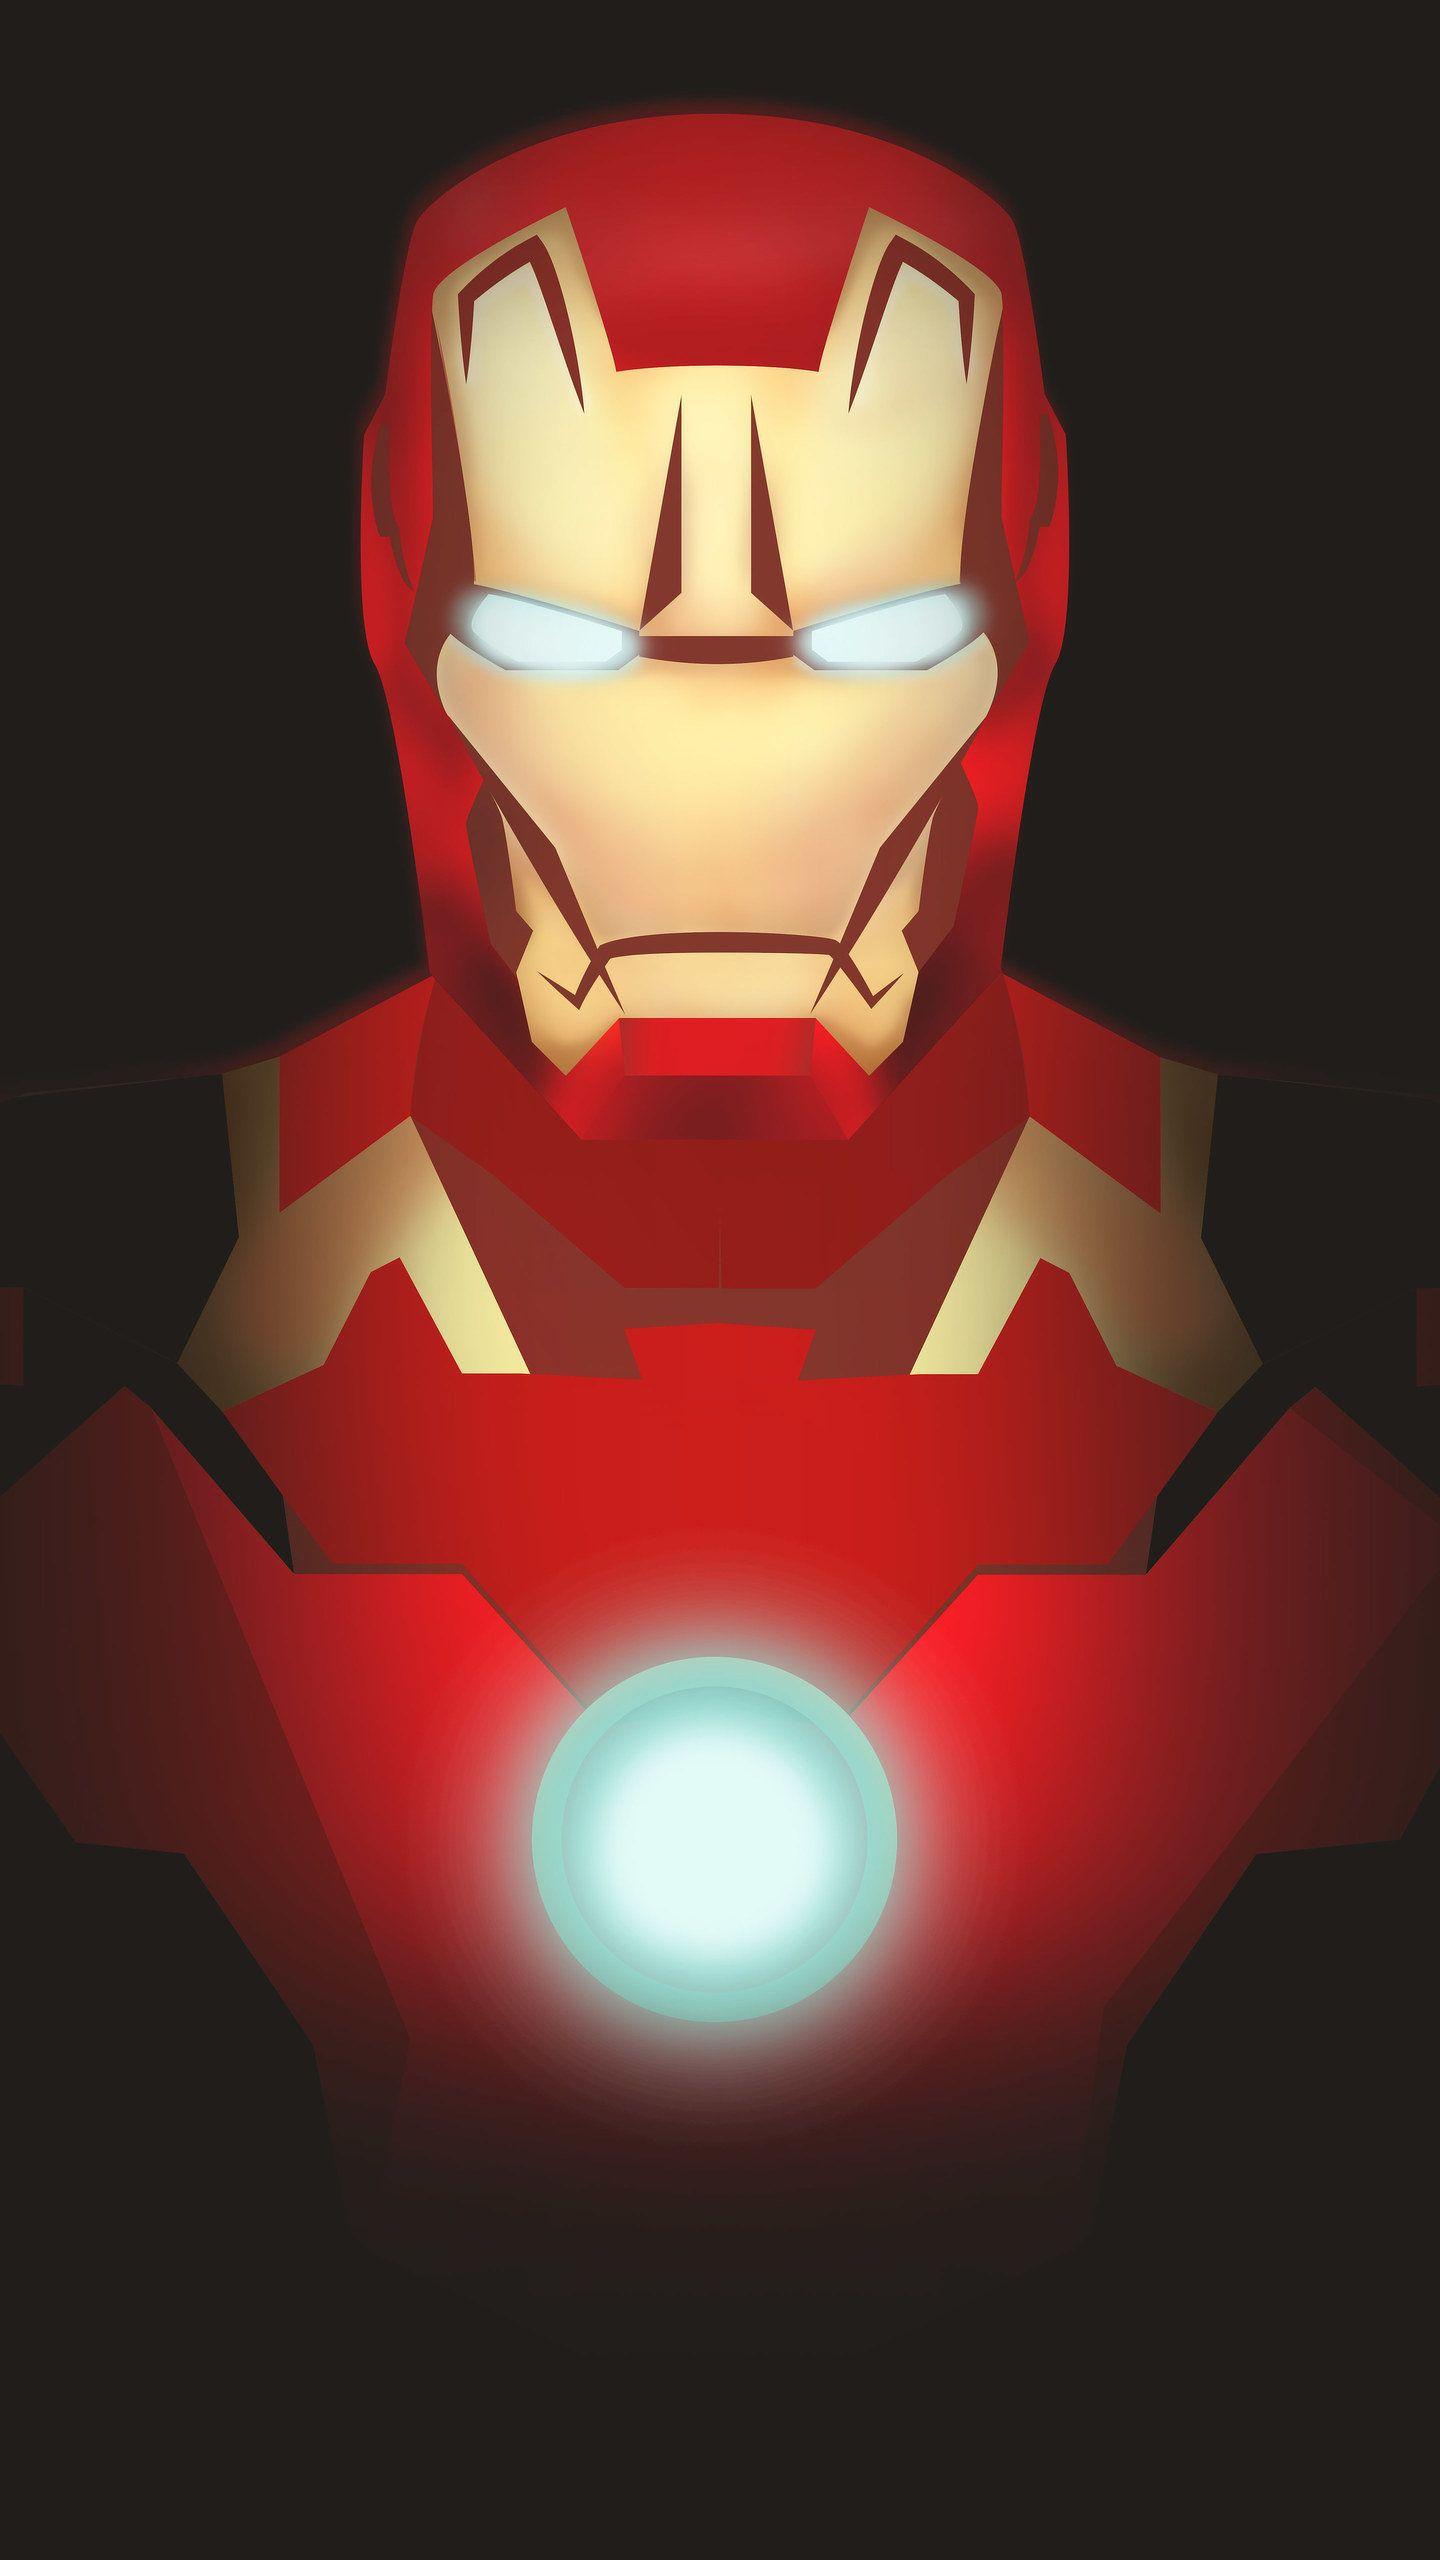 Iron Man Illustration HD Wallpaper Iron man wallpaper